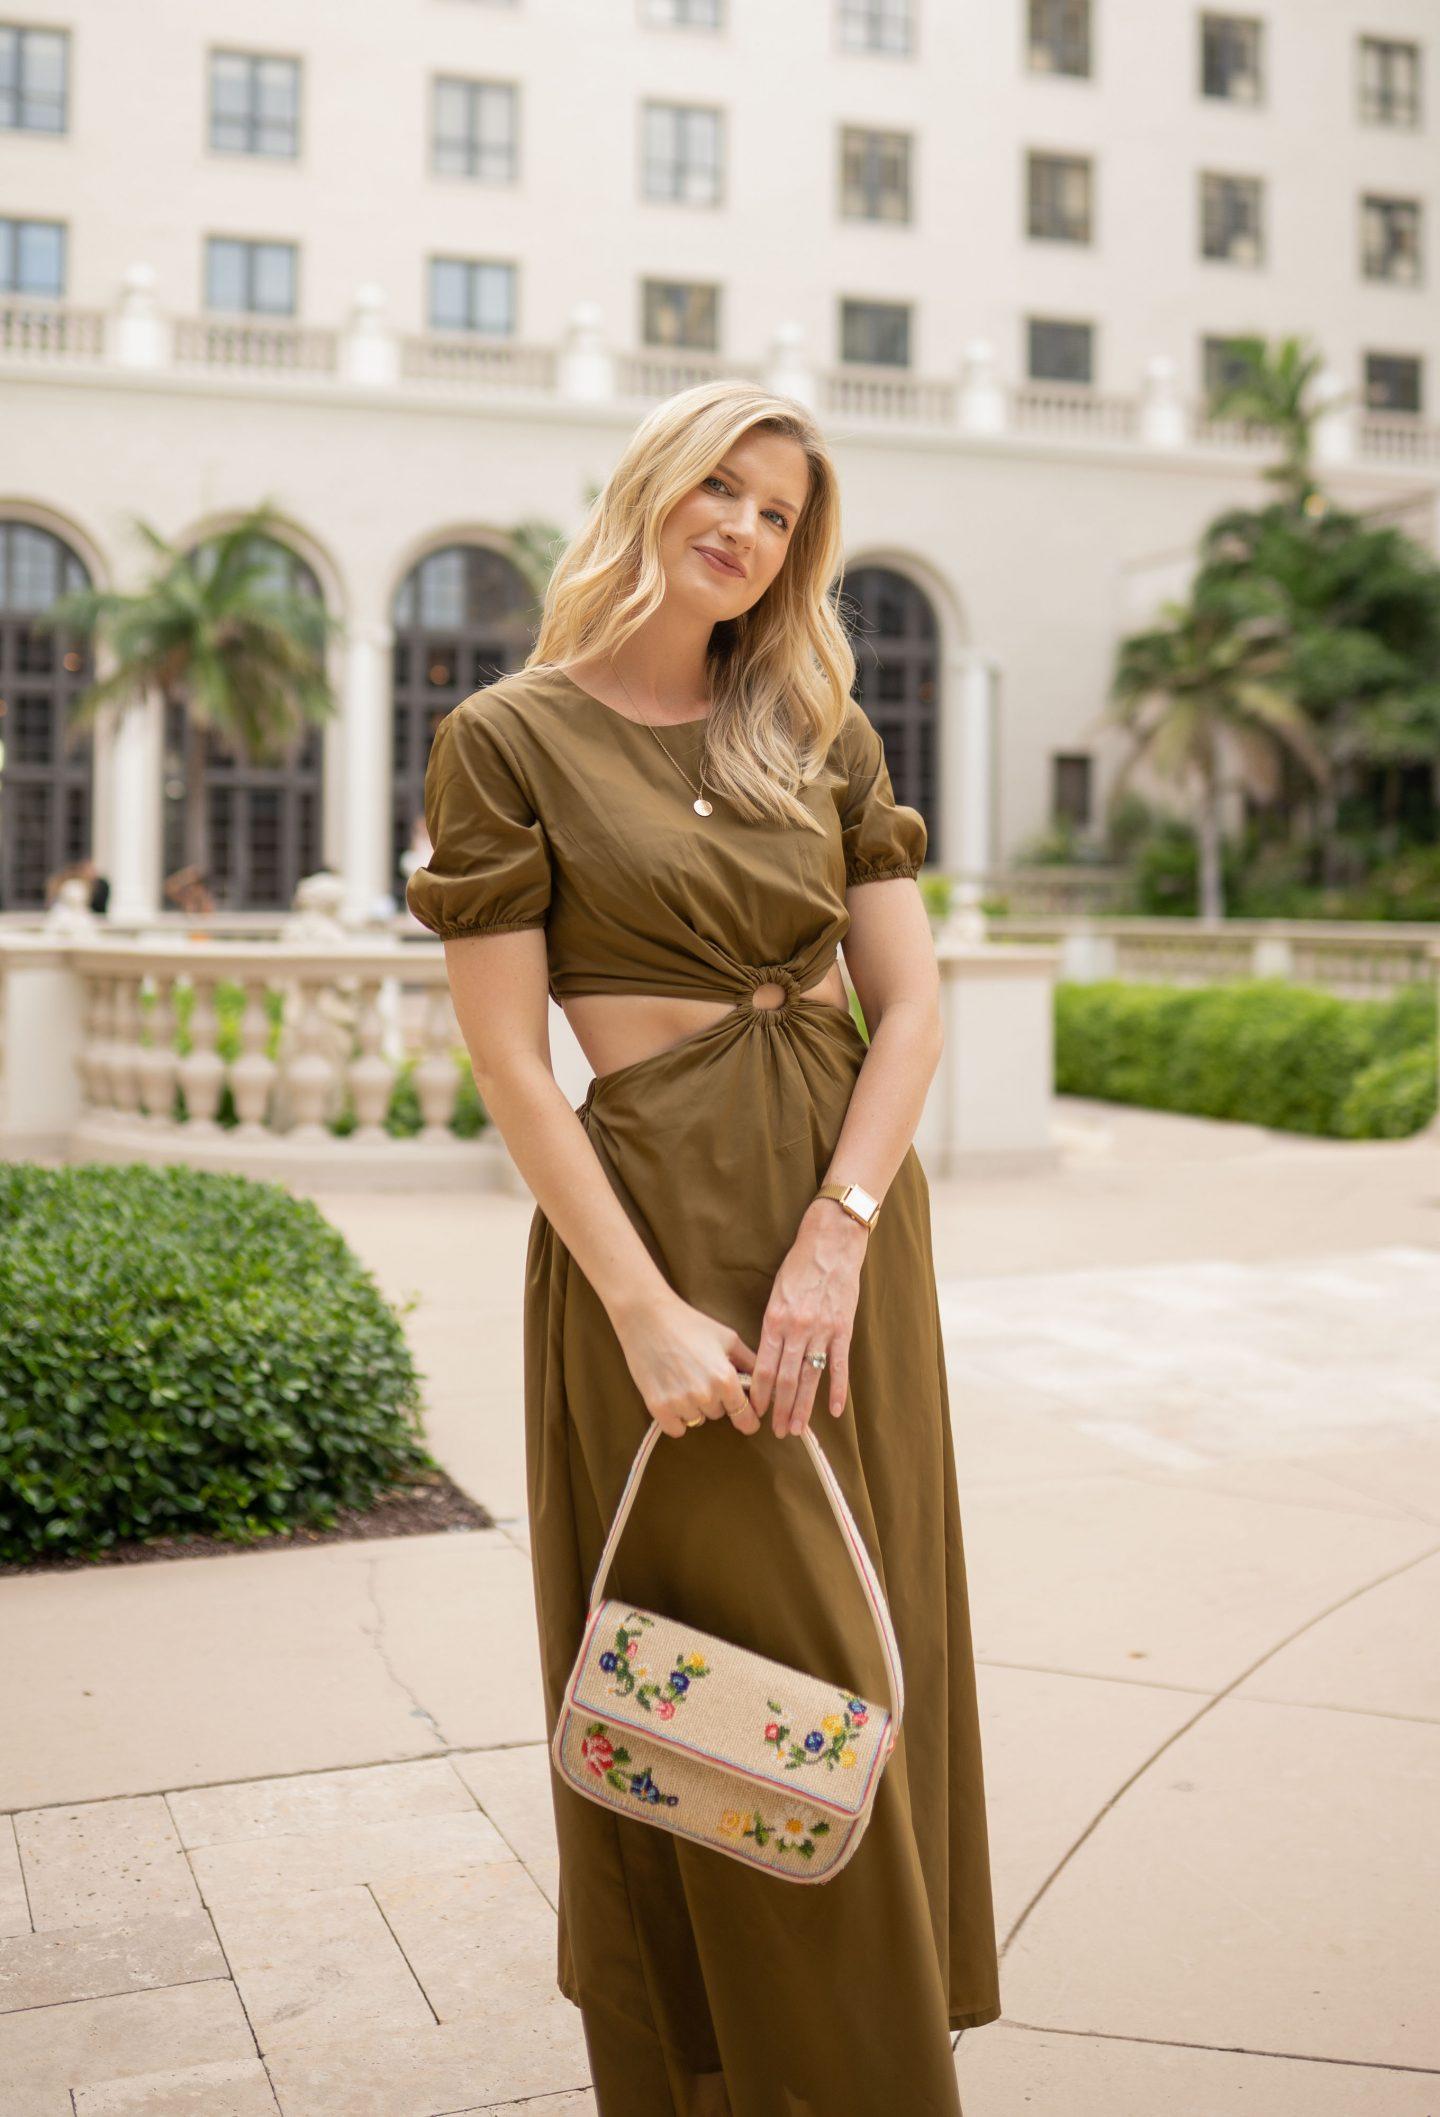 Making a Fall Statement | Staud Calypso Dress